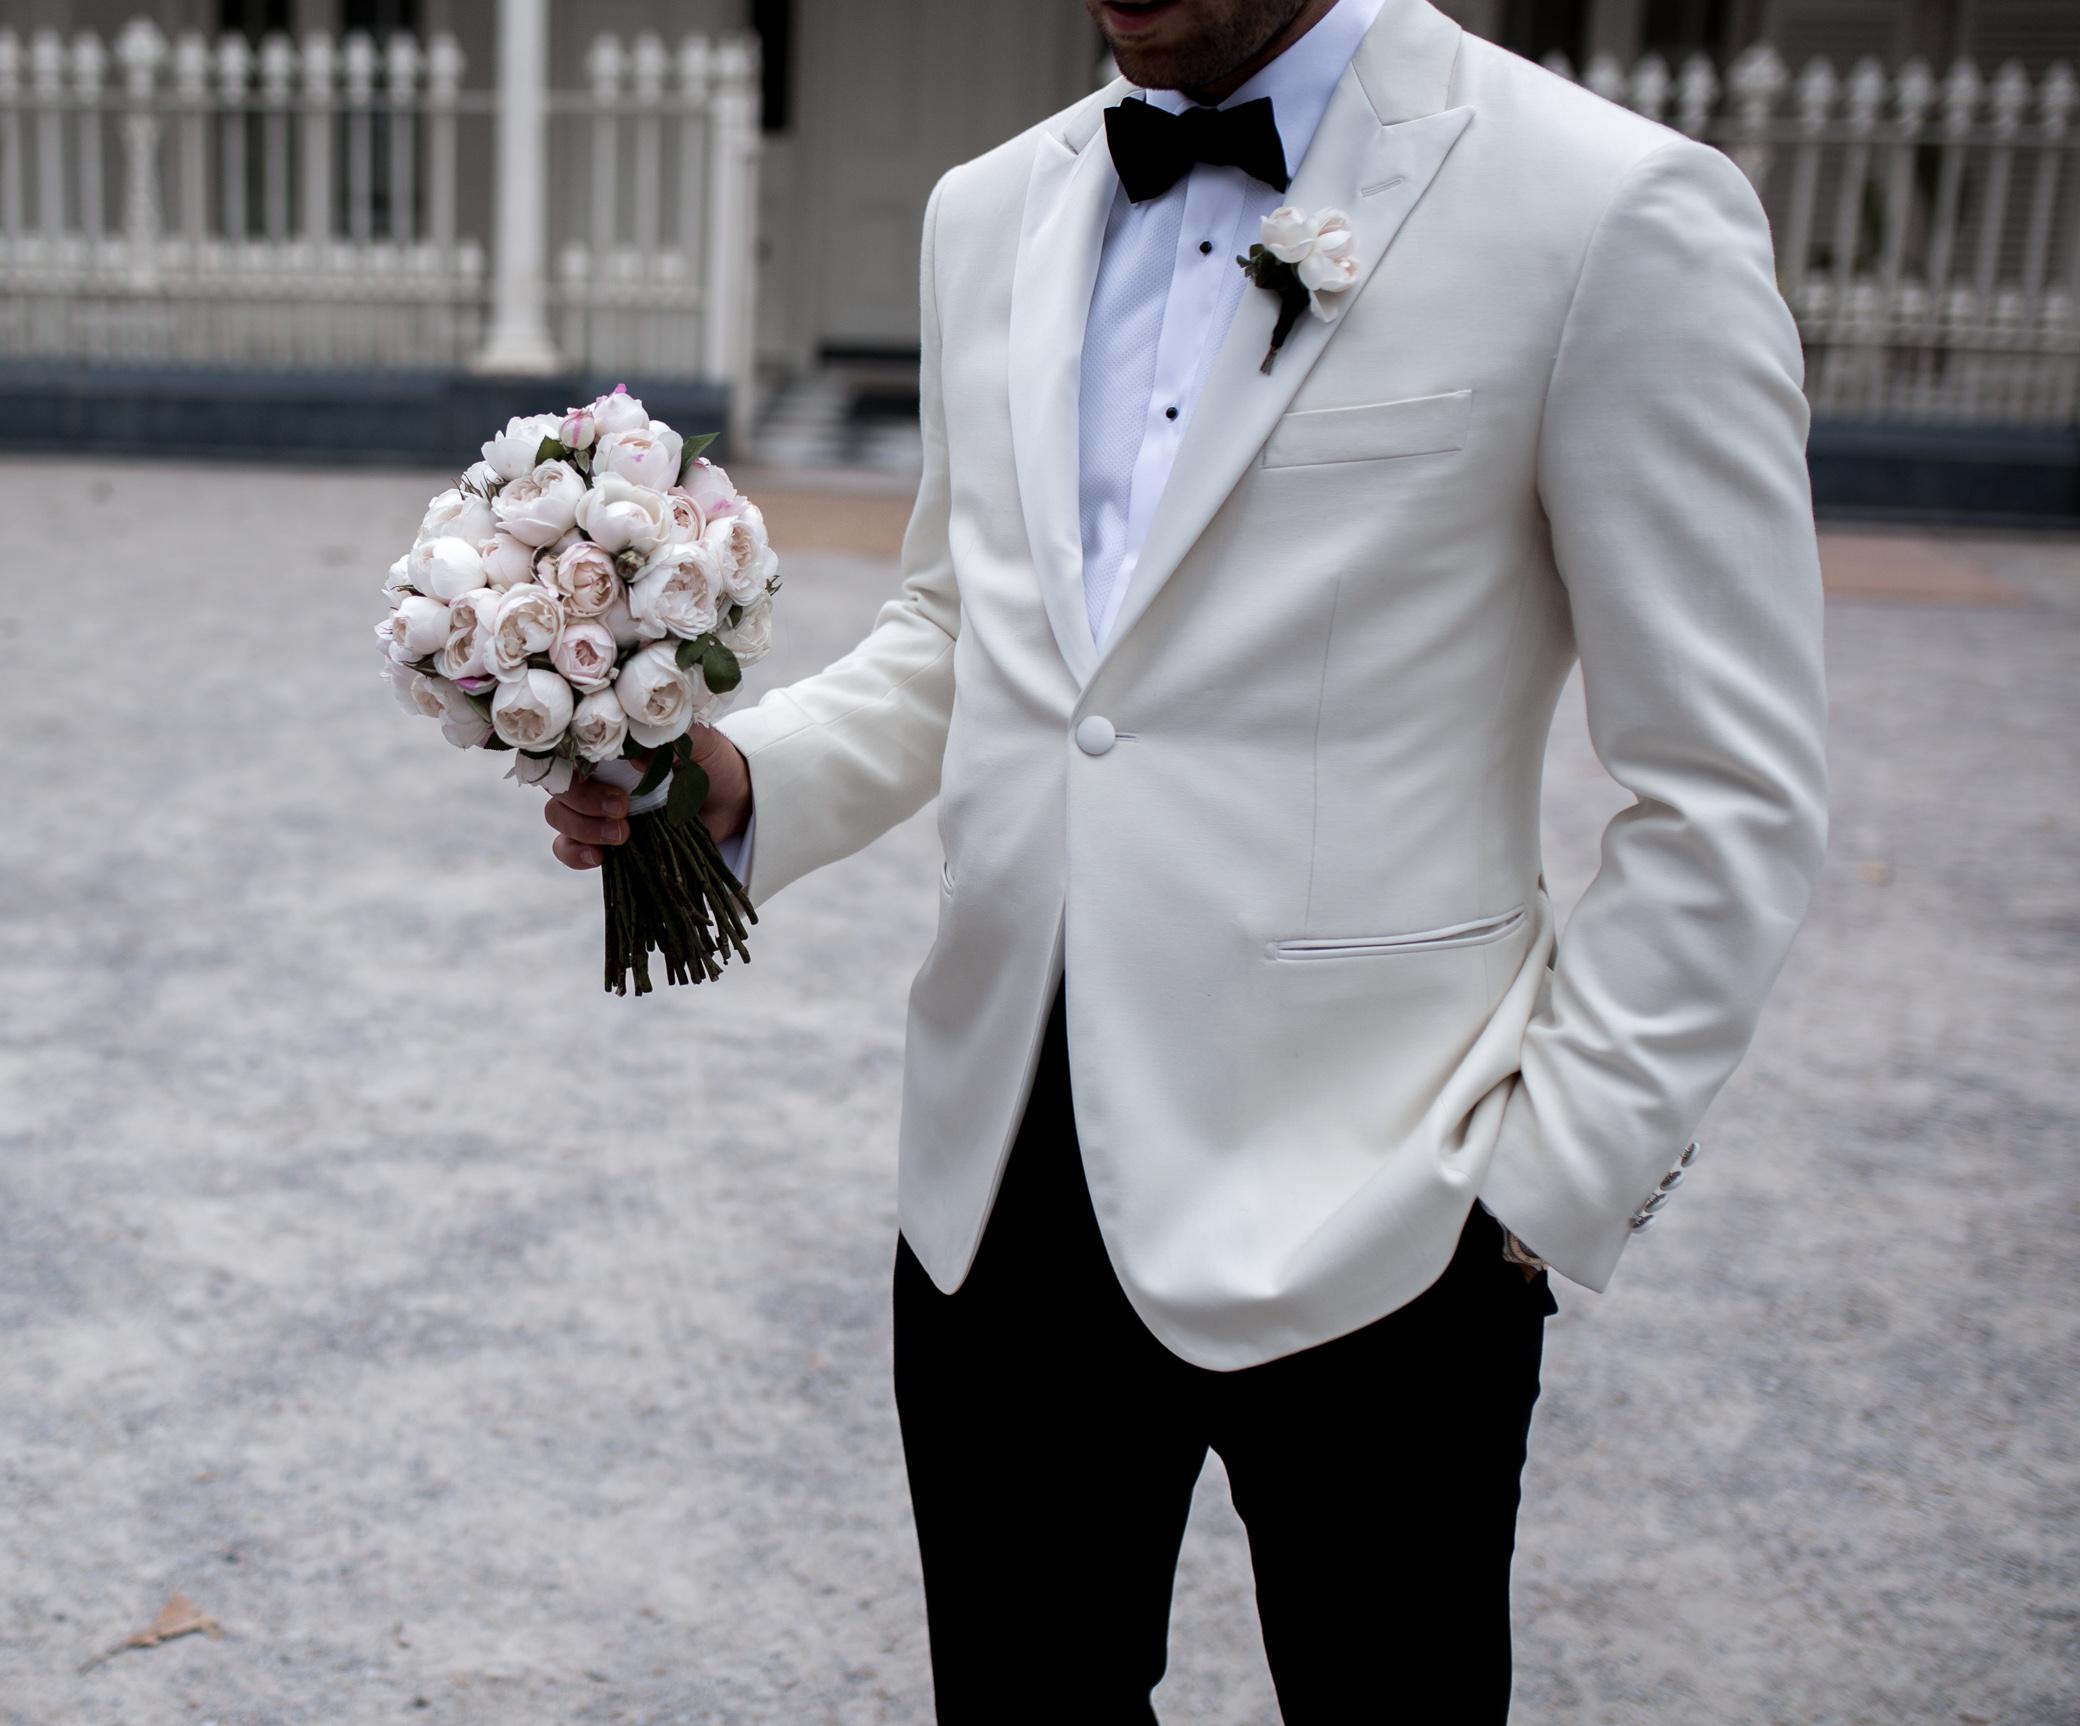 mr-theodore_white-vine-photography_same-sex-wedding-directory12.jpg